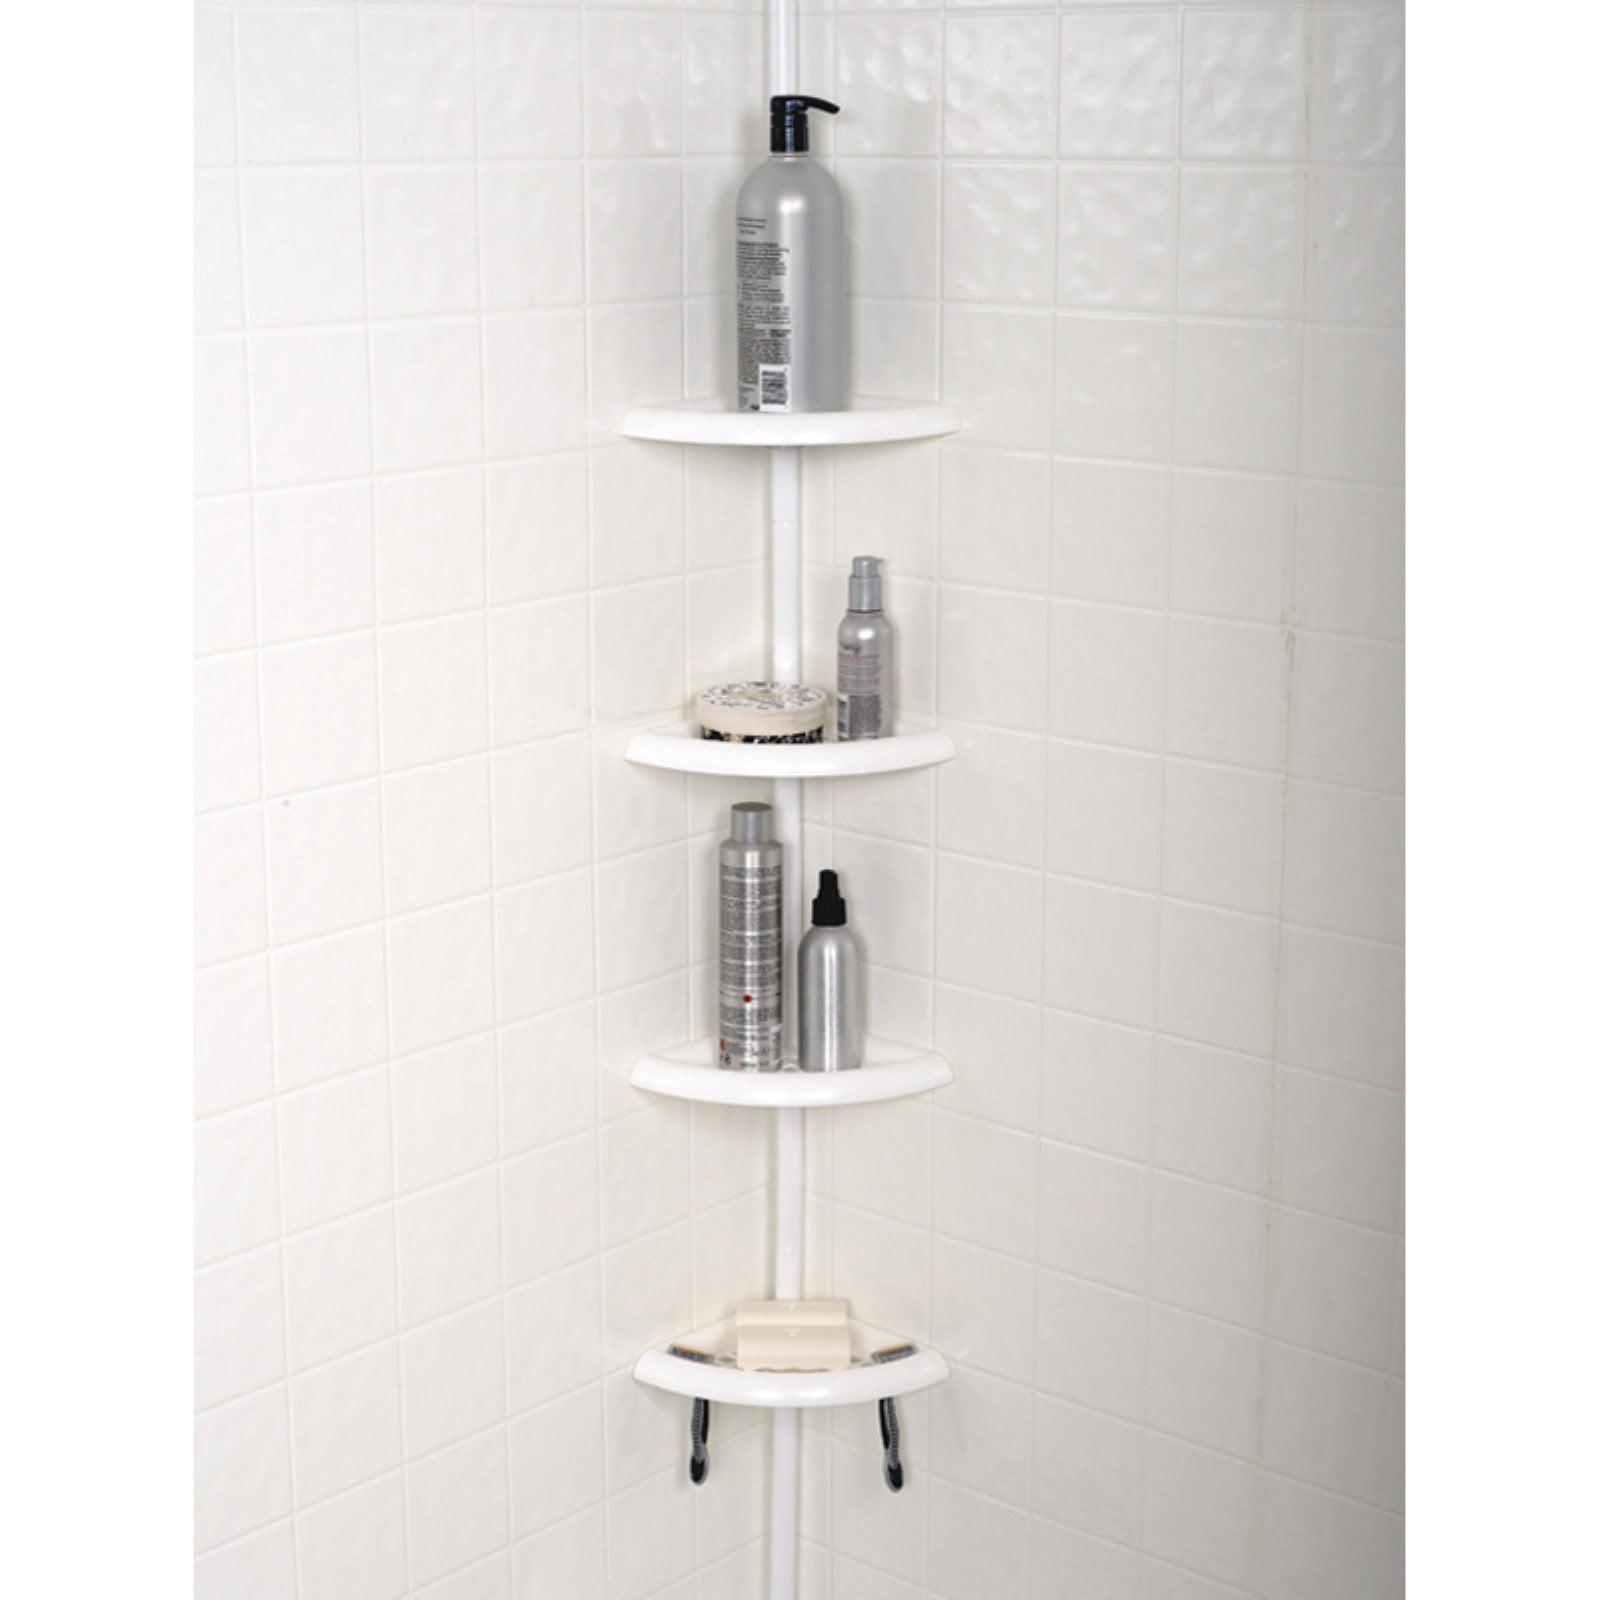 Zenna Home 2104W, Bathtub and Shower Pole Caddy, White